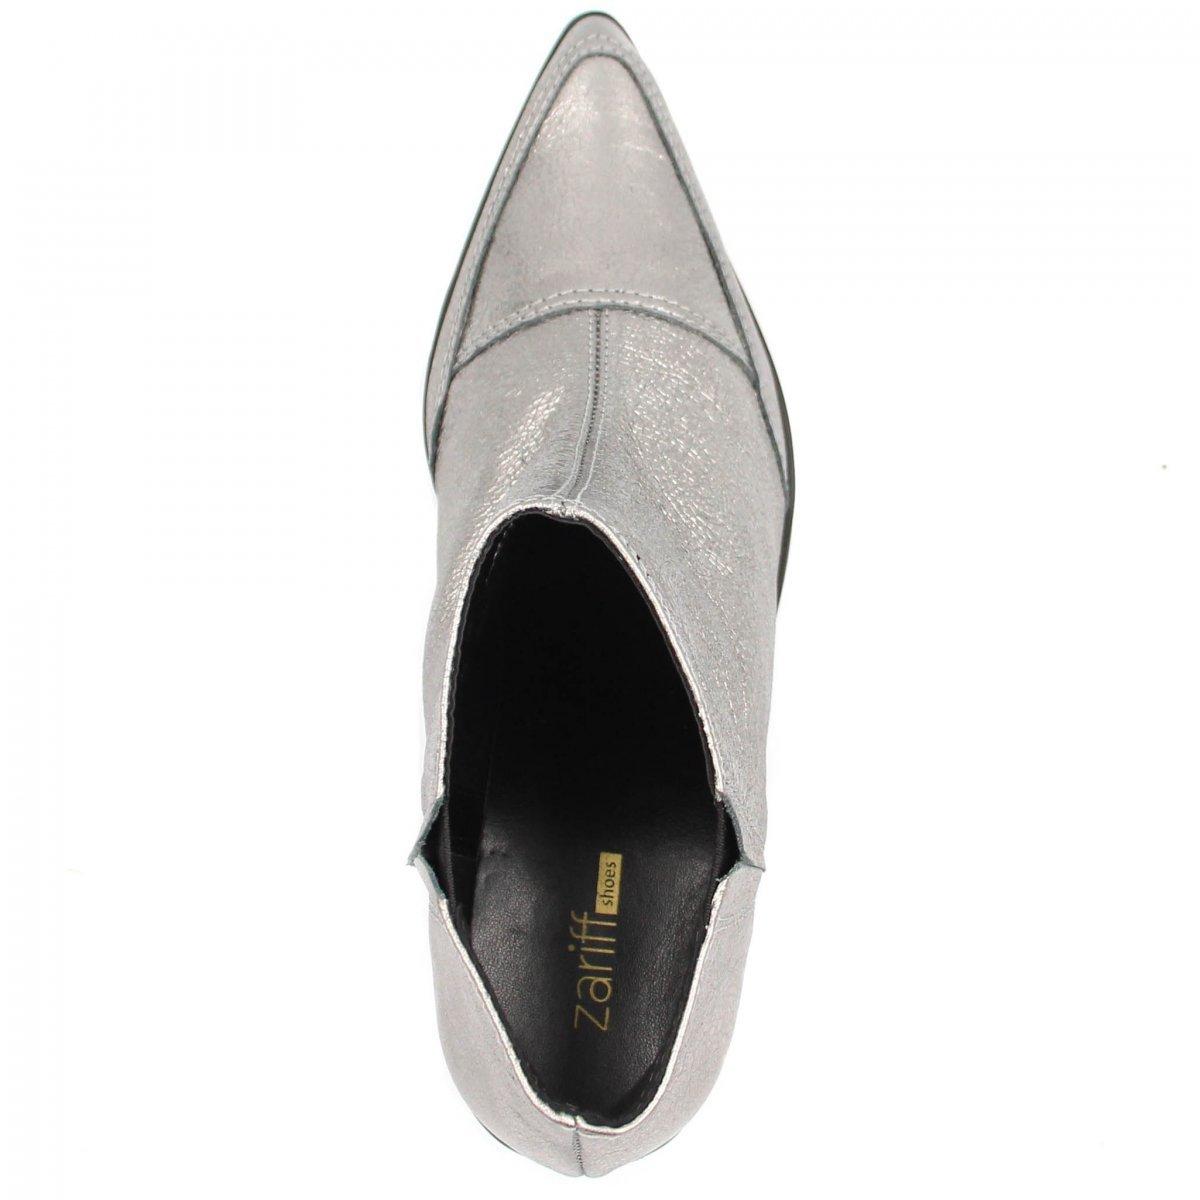 Boot Boot Feminino Ankle Bota Shoes Prata Ankle Bota Zariff Shoes Couro Zariff 5RW8HqW